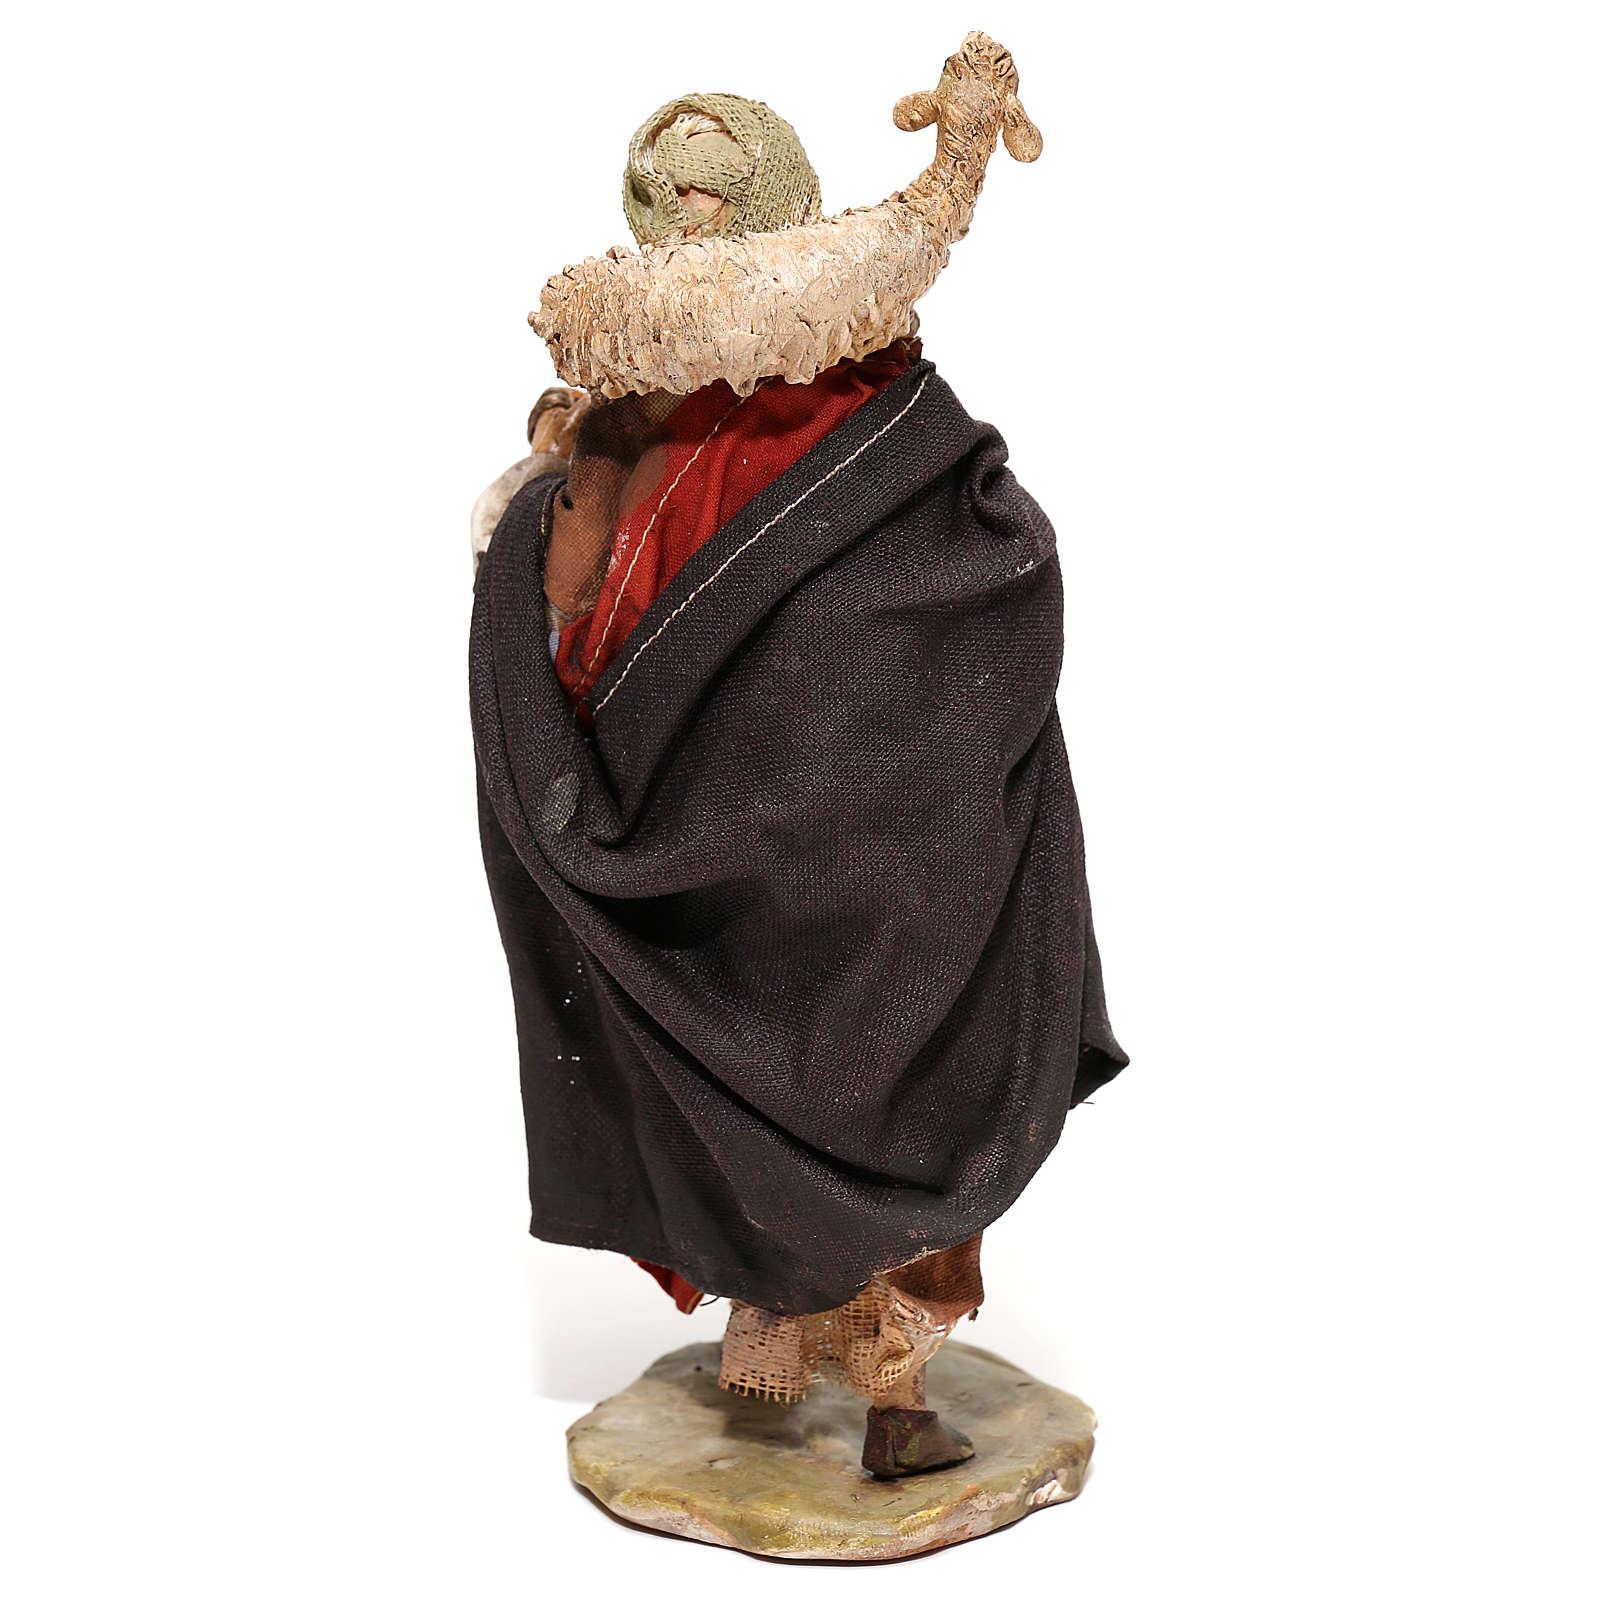 Nativity scene figurine, Shepherd carrying a sheep by Angela Tripi 13 cm 4